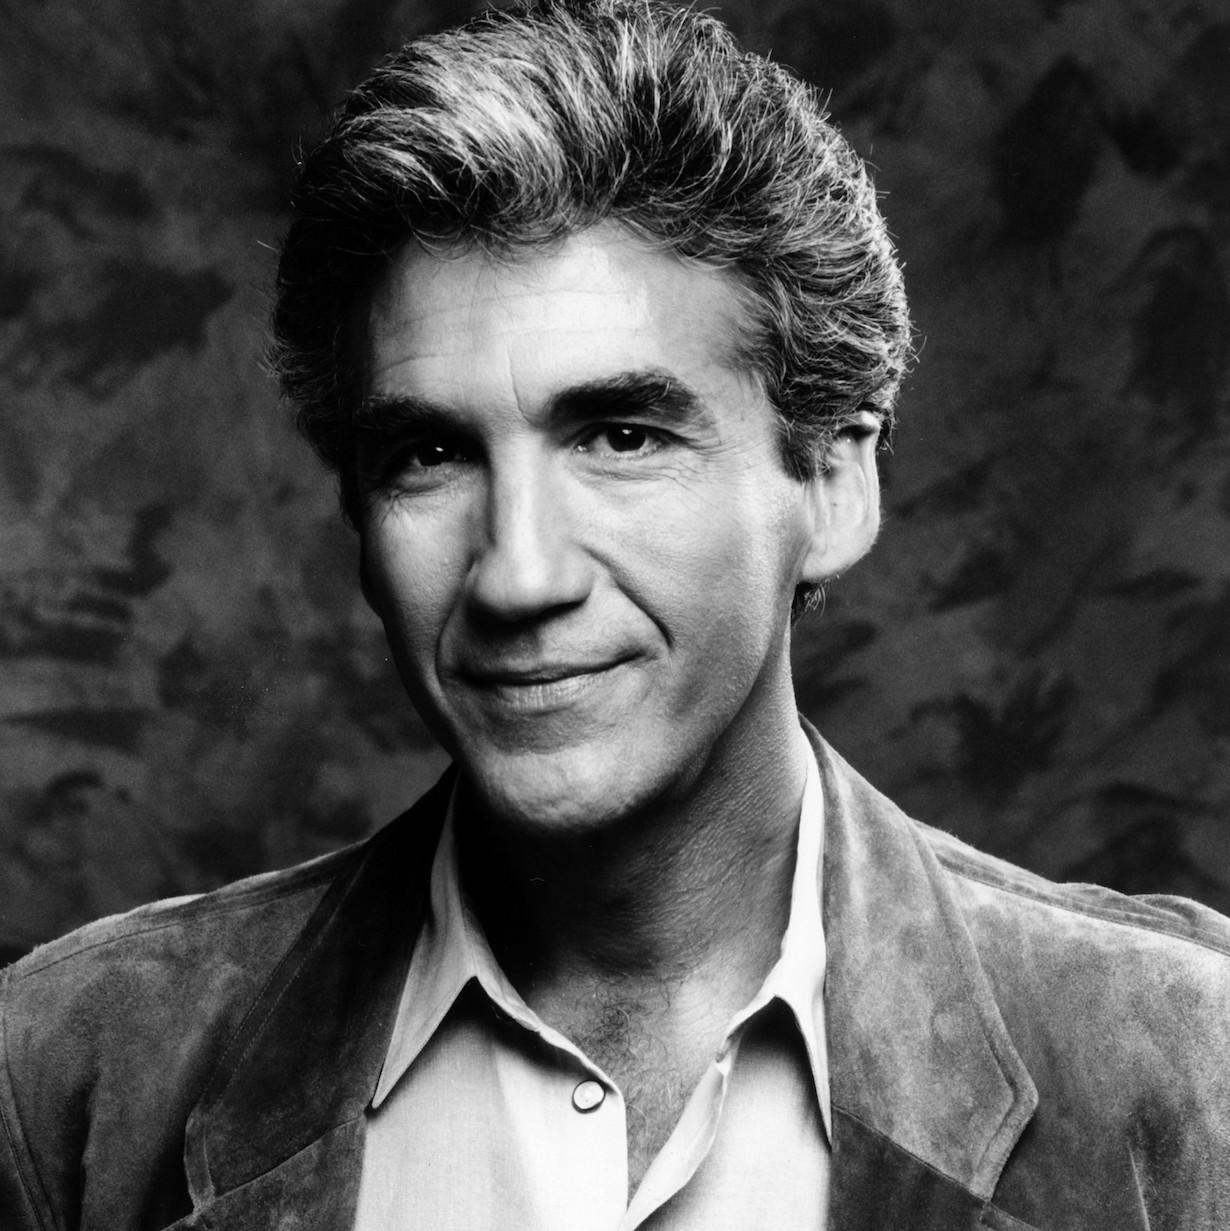 THE GUIDING LIGHT, Michael Zaslow, early 1990s, 1952-2009. ph: E.J. Carr/© CBS /Courtesy Everett Collection